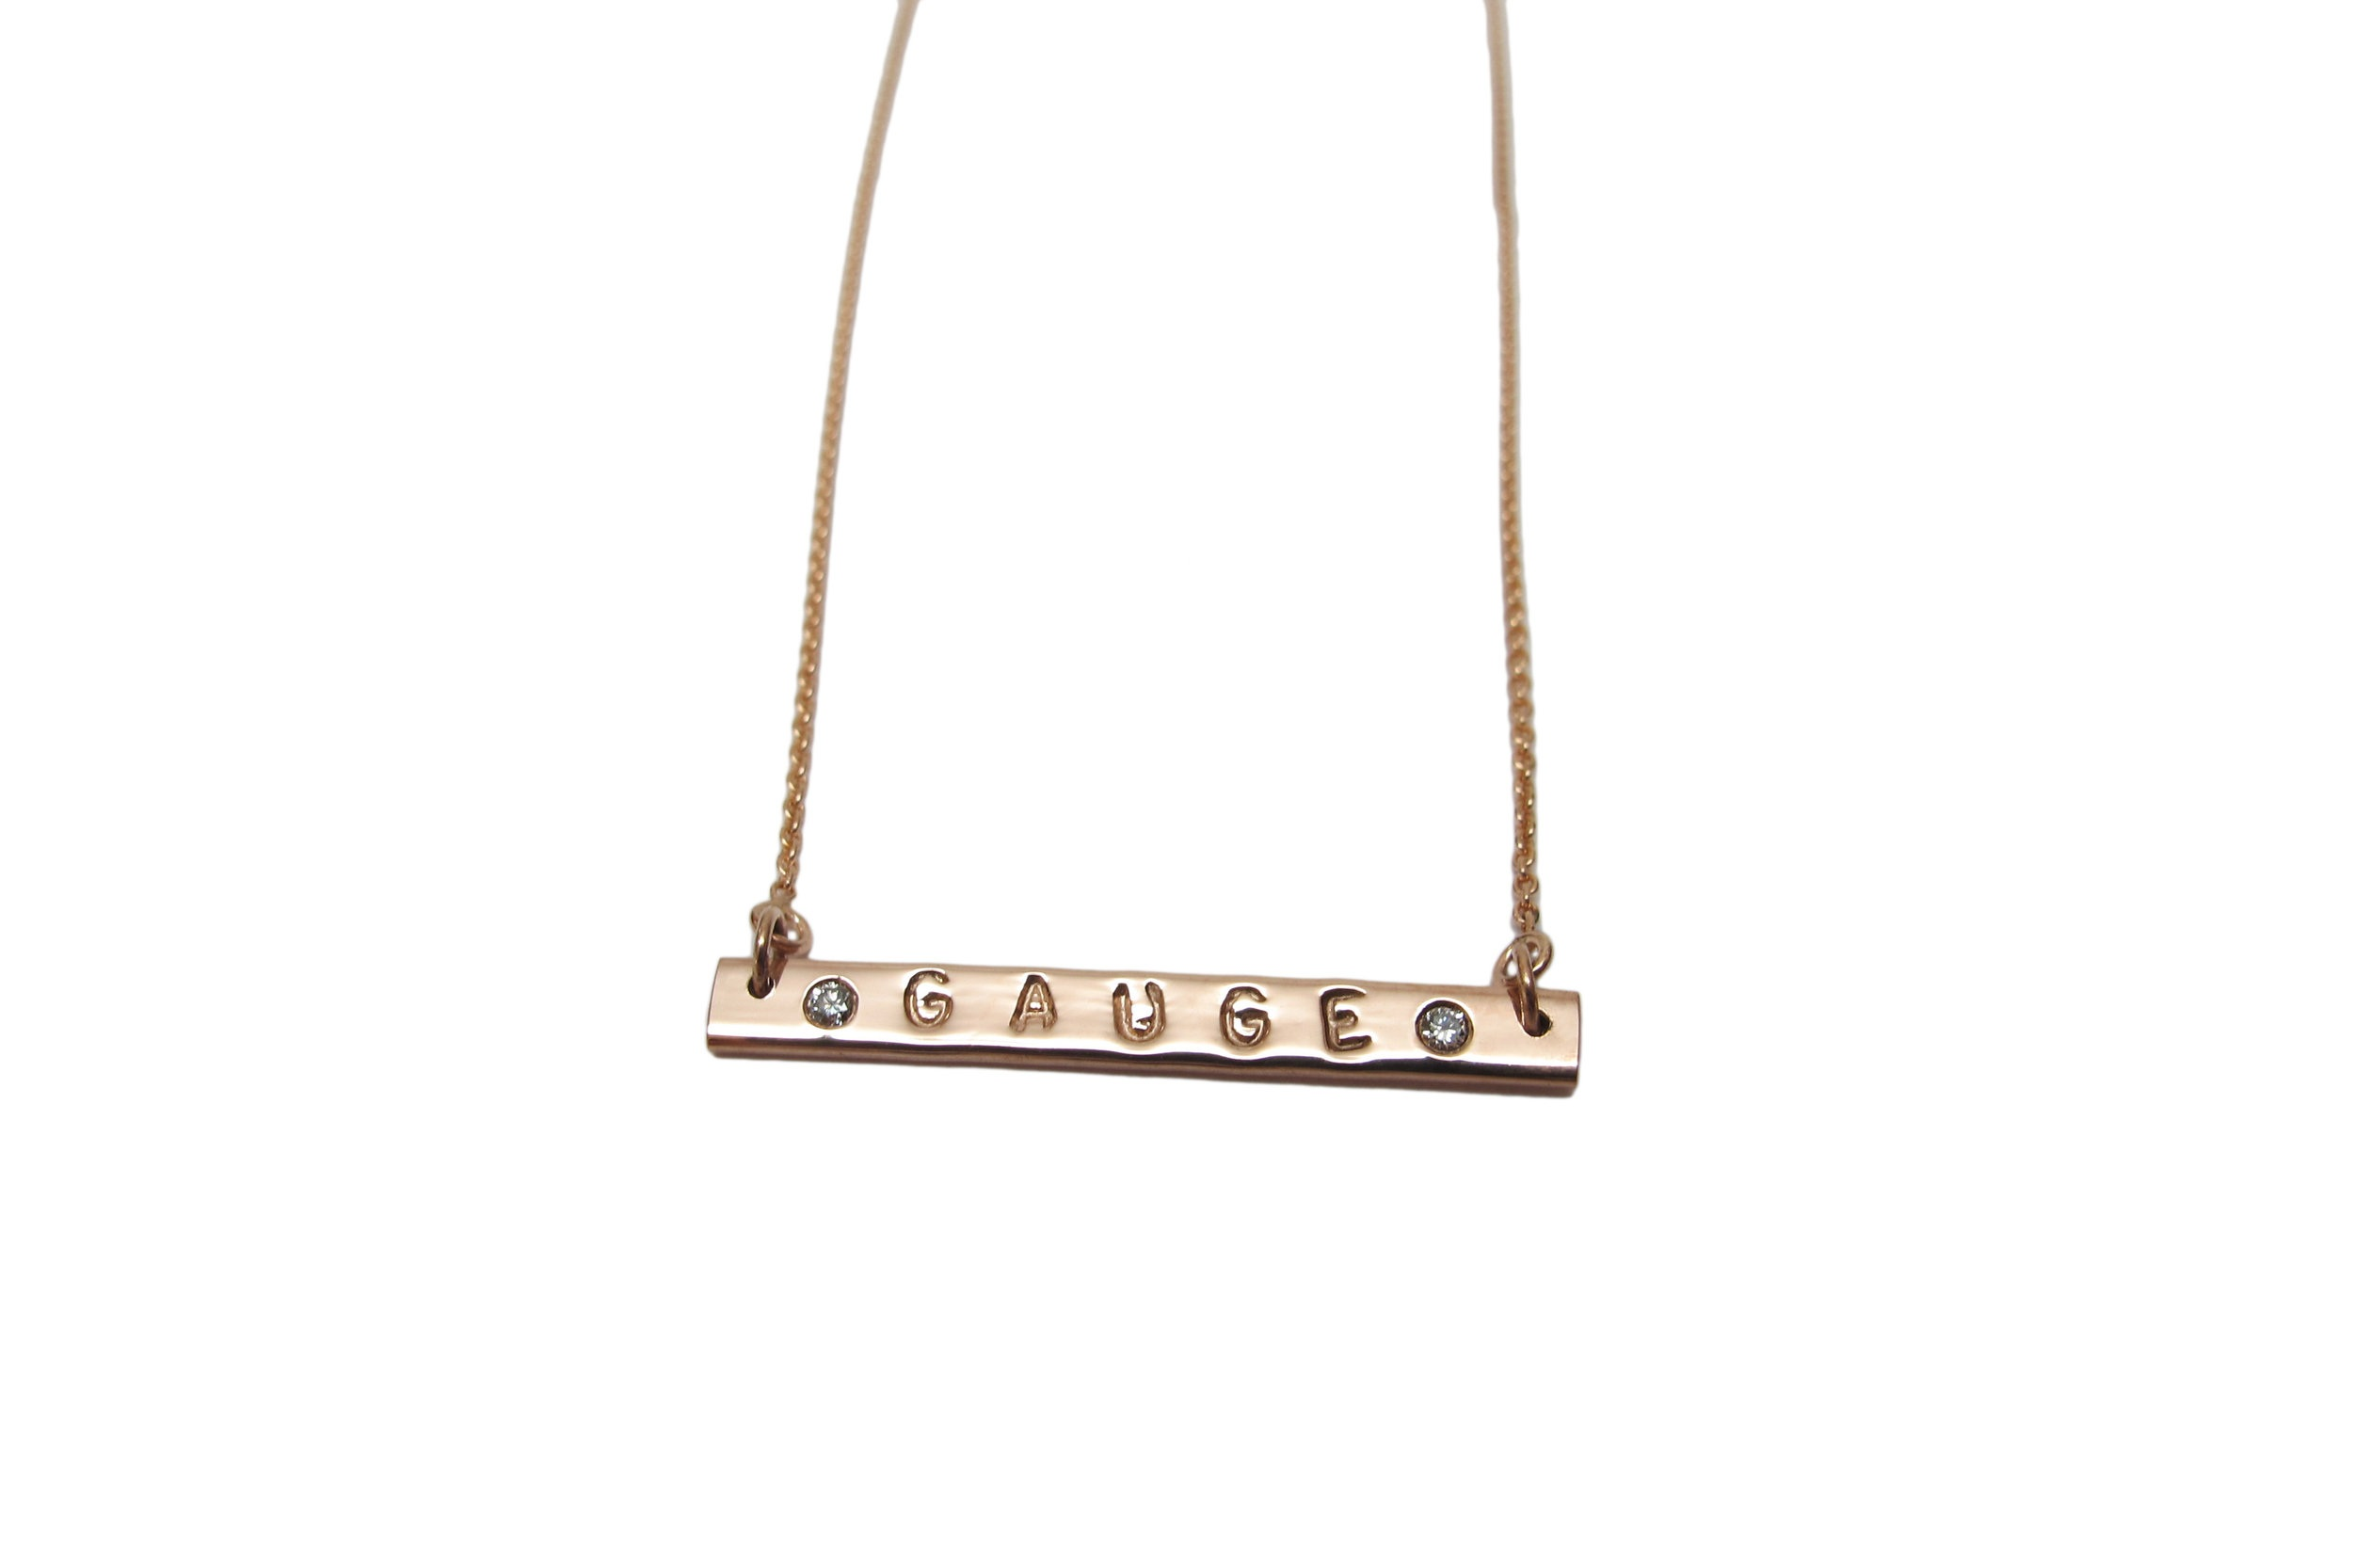 ROSE GOLD NAME NECKLACE + DIAMONDS